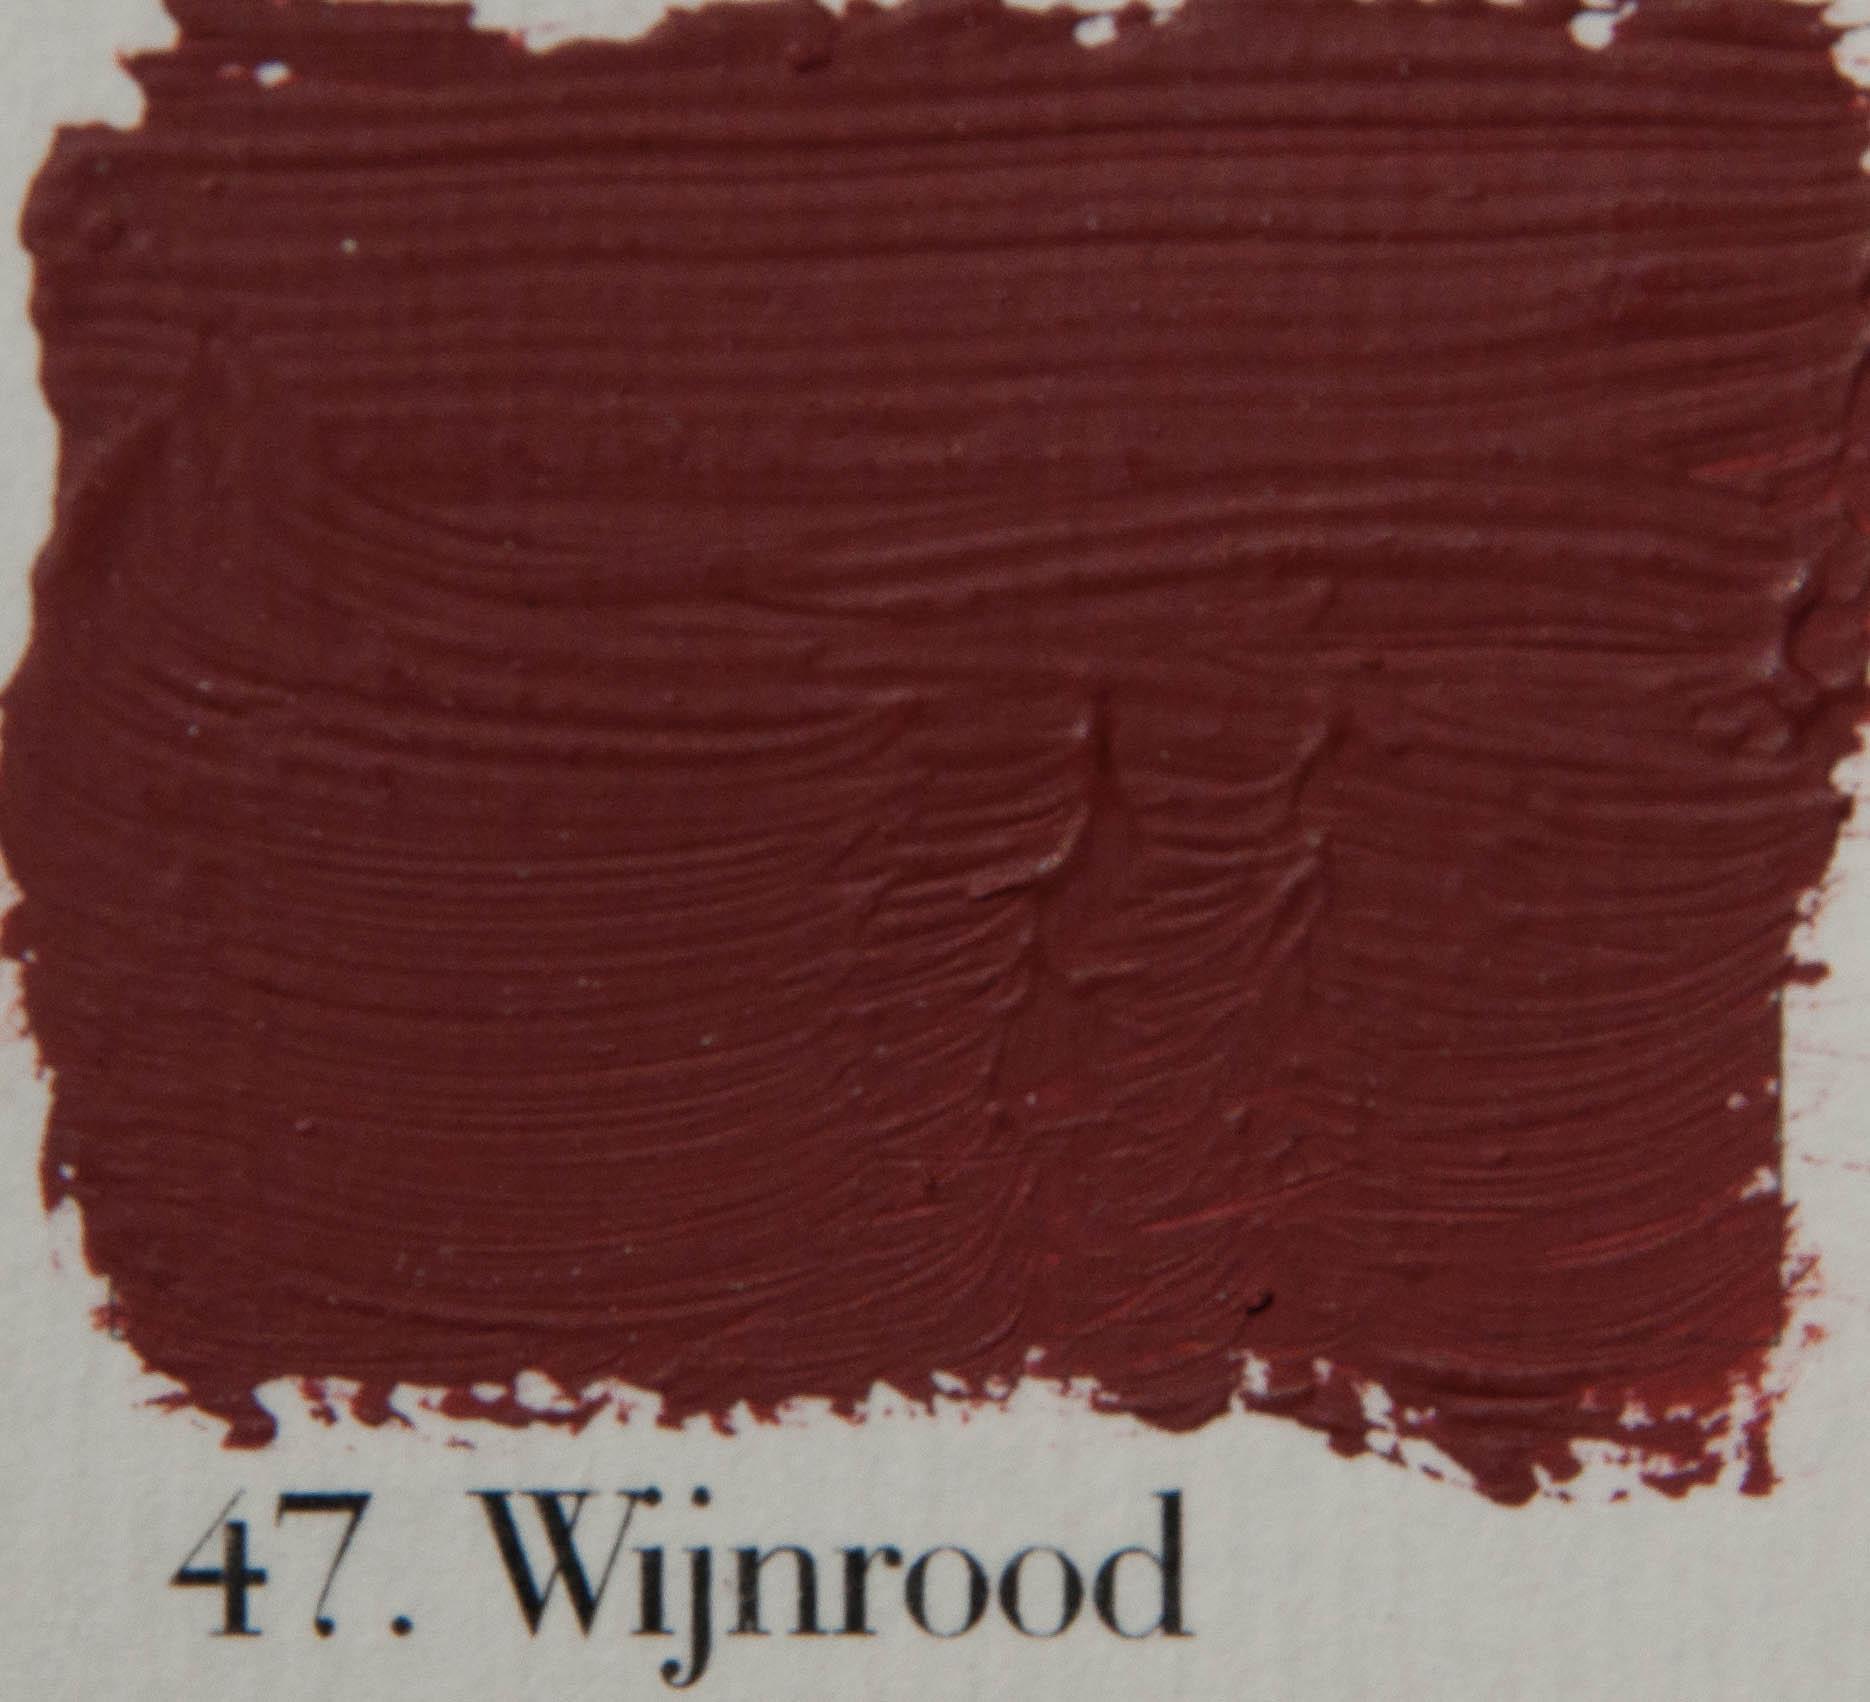 'l Authentique krijtverf 47. Wijnrood